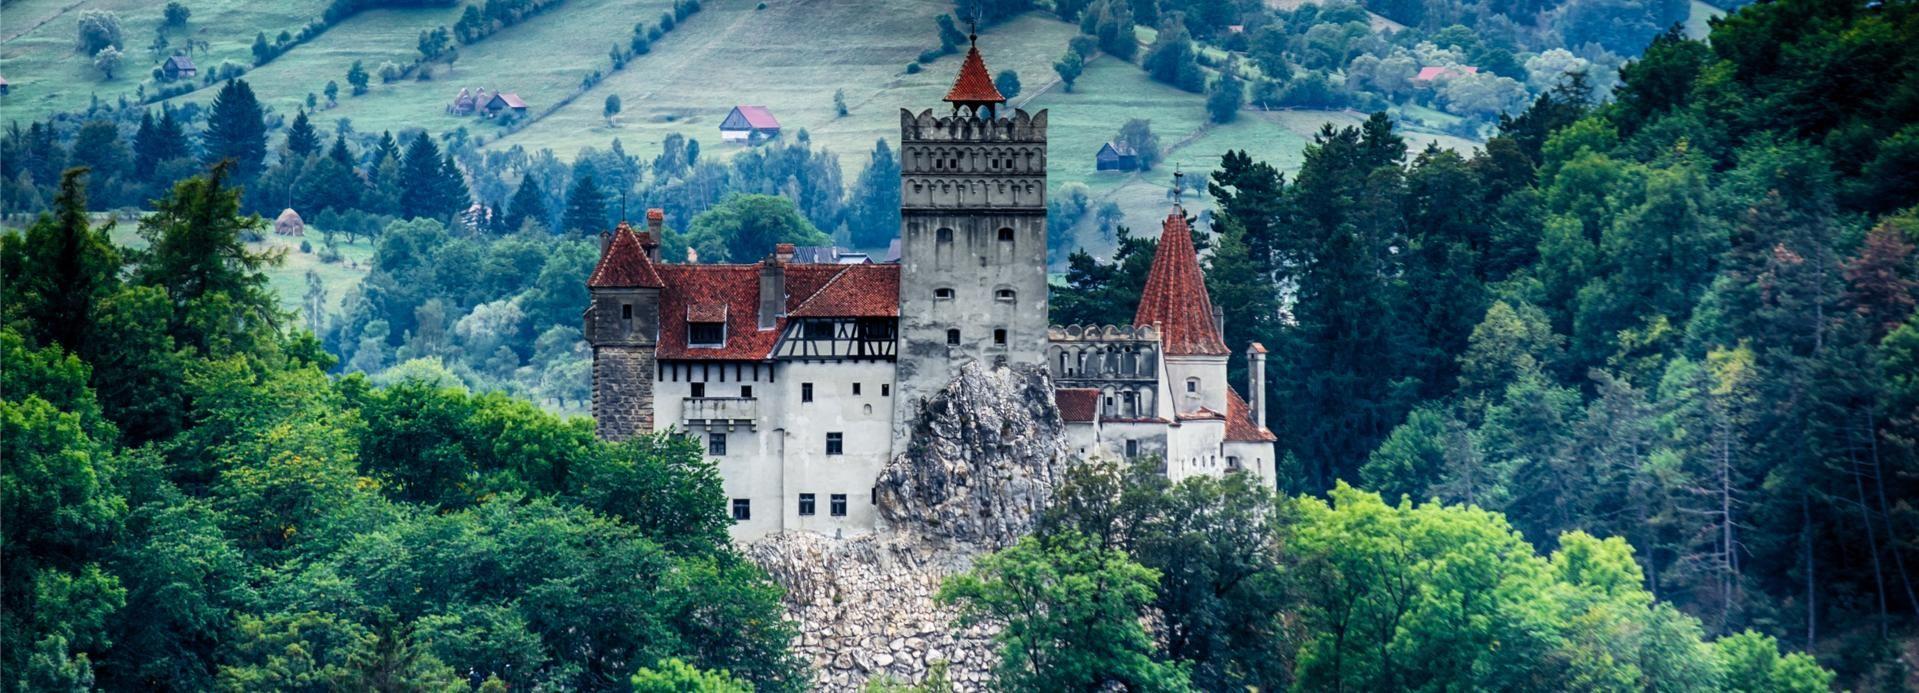 Bucarest: tour del Castello di Dracula, Peleș e Brașov